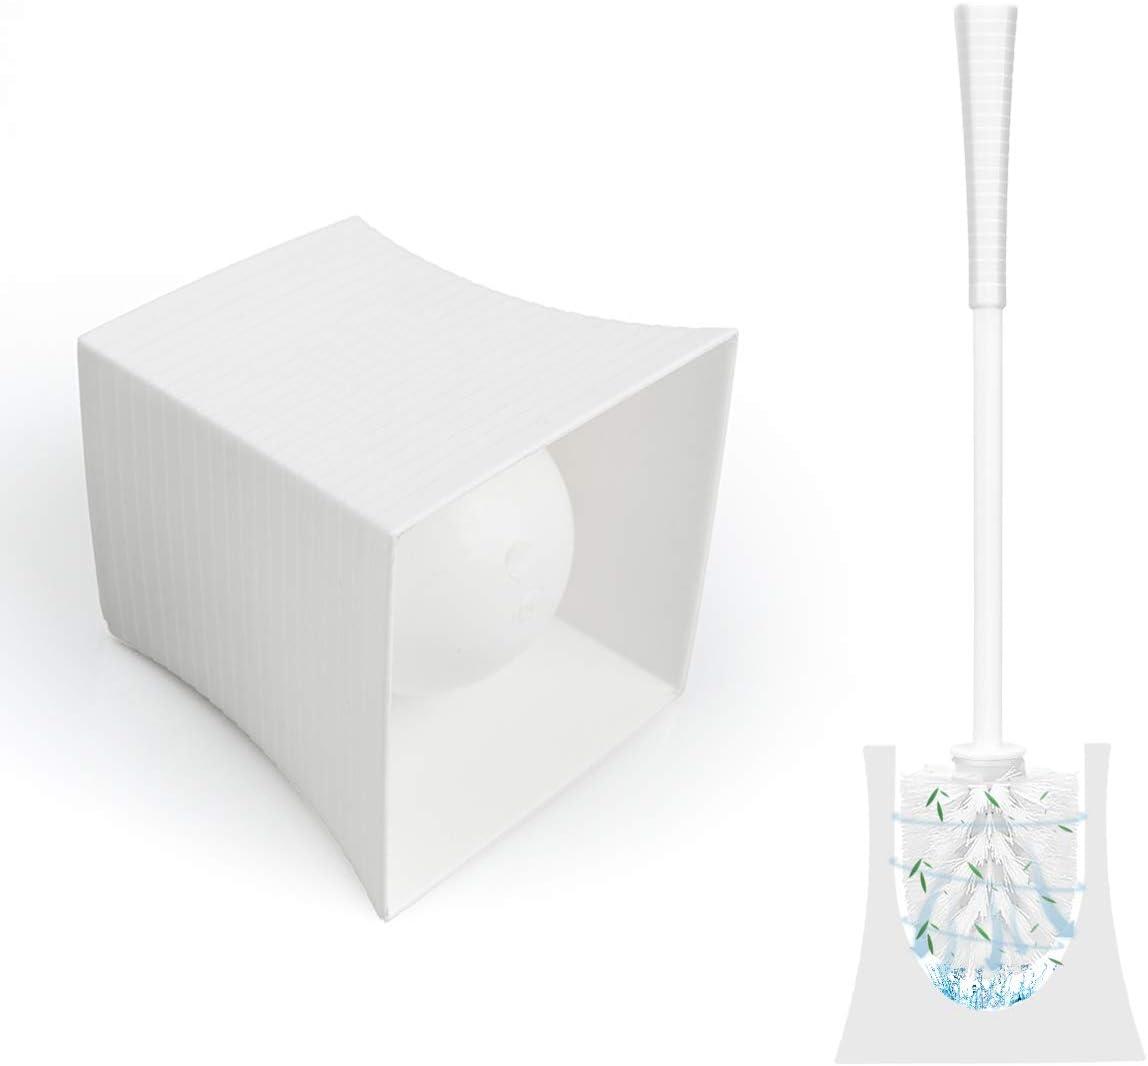 HW Plastic Toilet Brush Set Long handle Mini style Compact Toilet Brush and Holder Leak-Proof Bathroom Toilet Bowl Brush Deep Cleaning Modern Design White Flooring